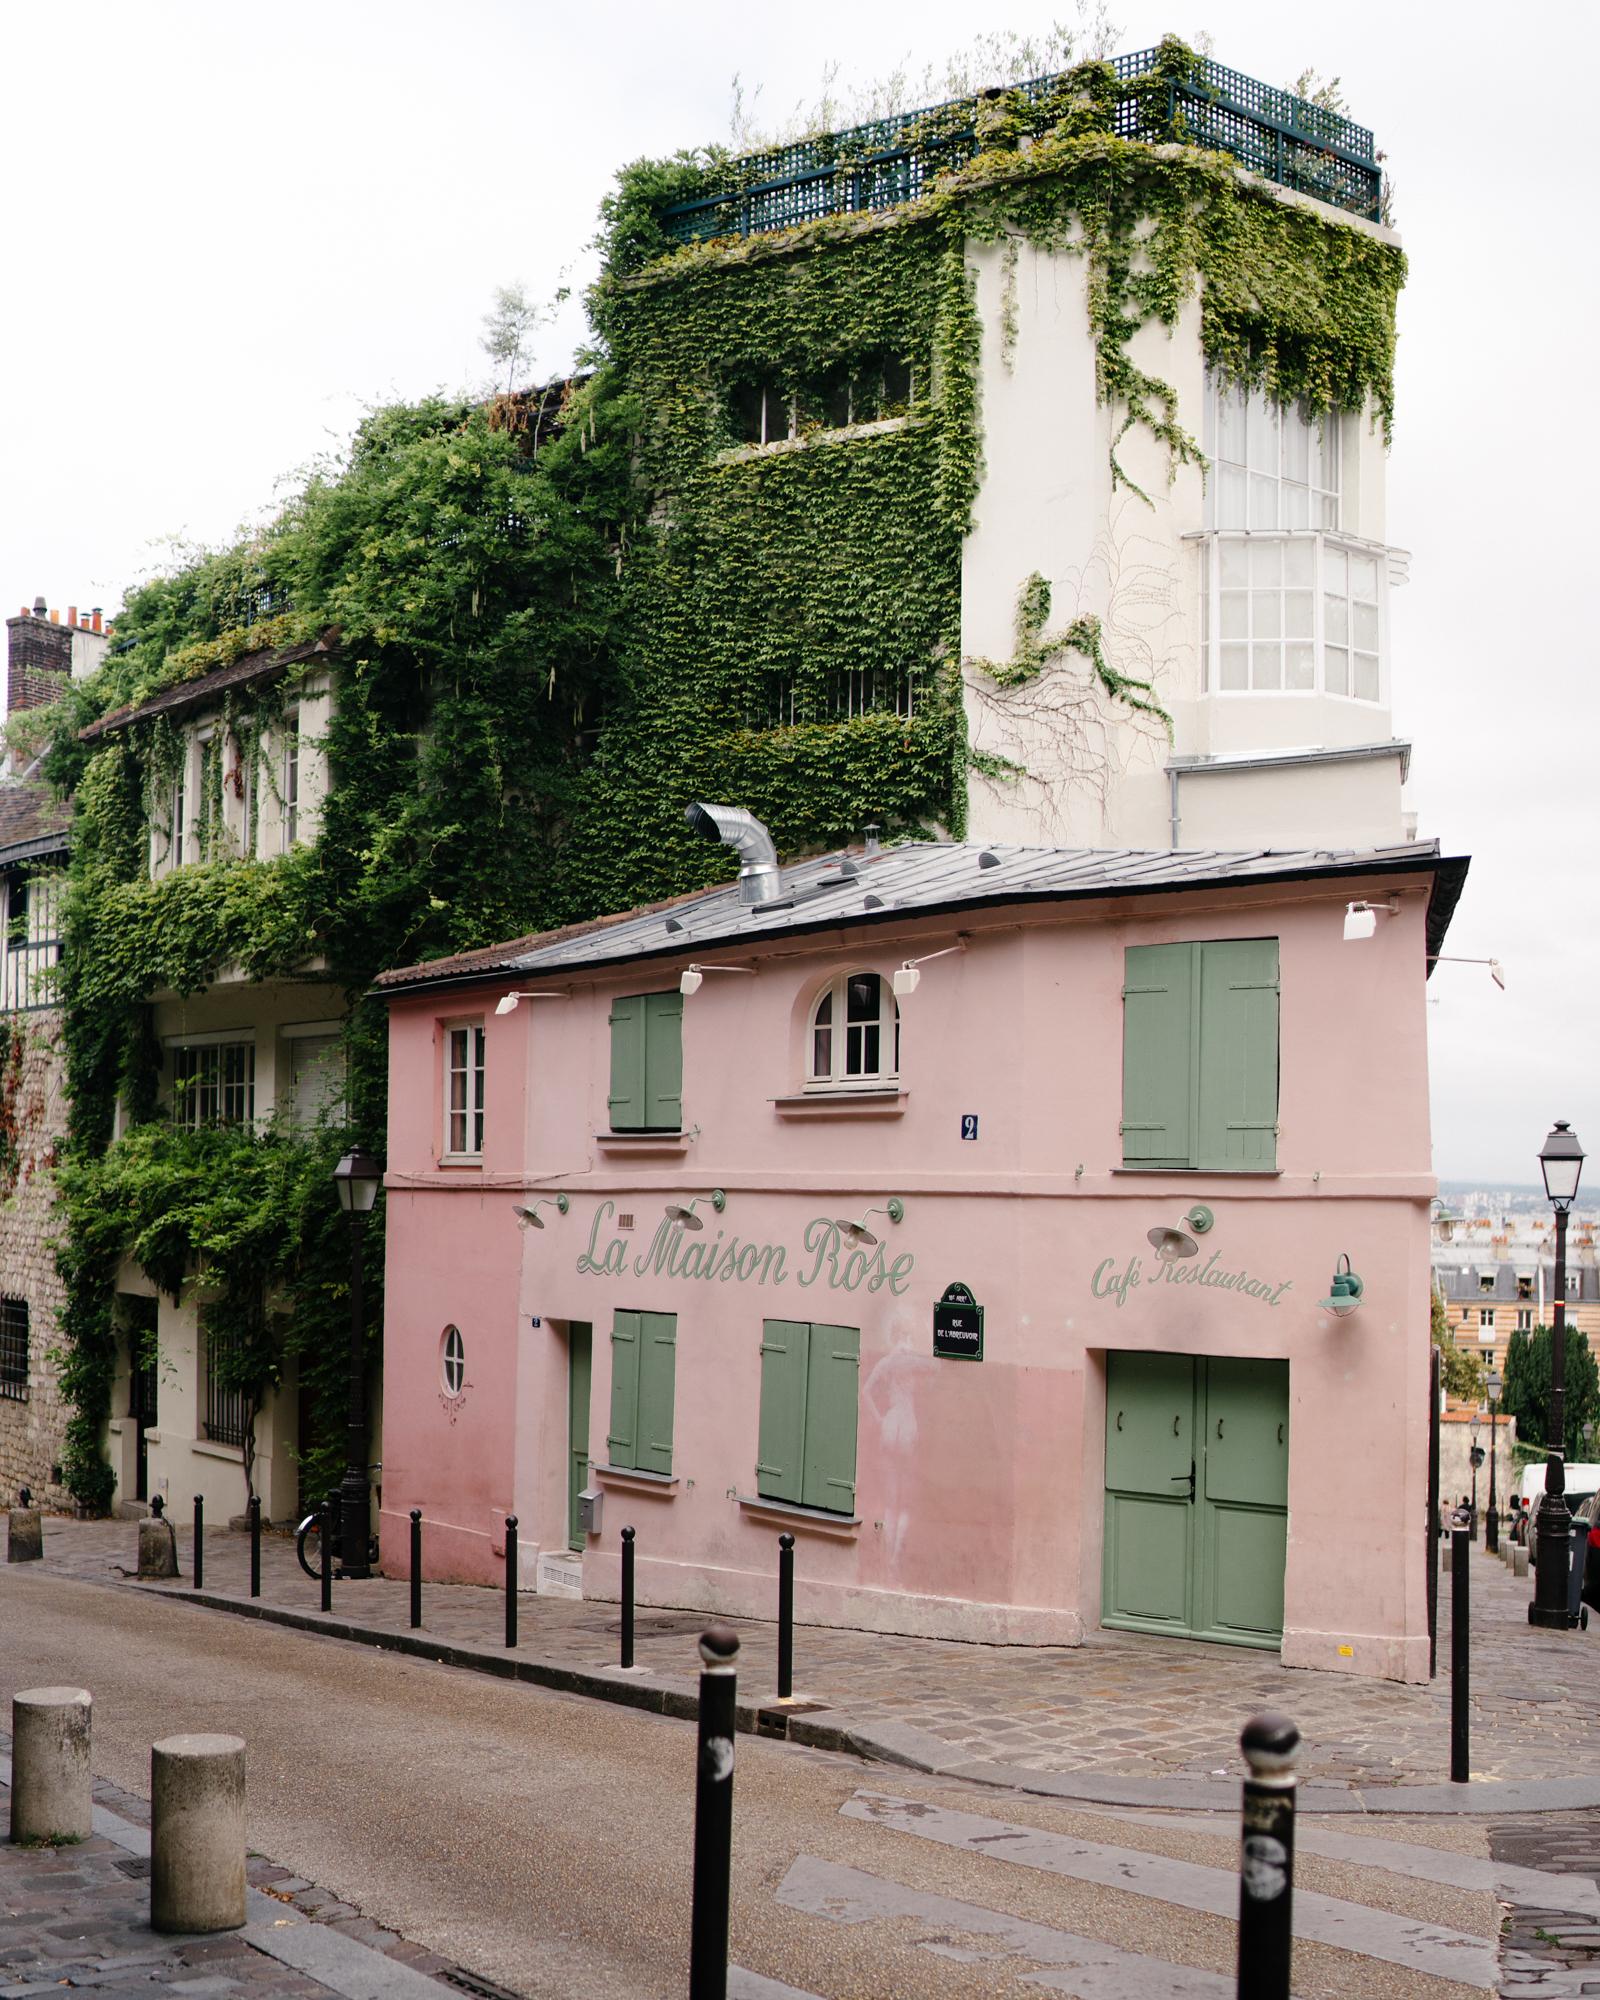 Best Instagram Photo Guide for Paris